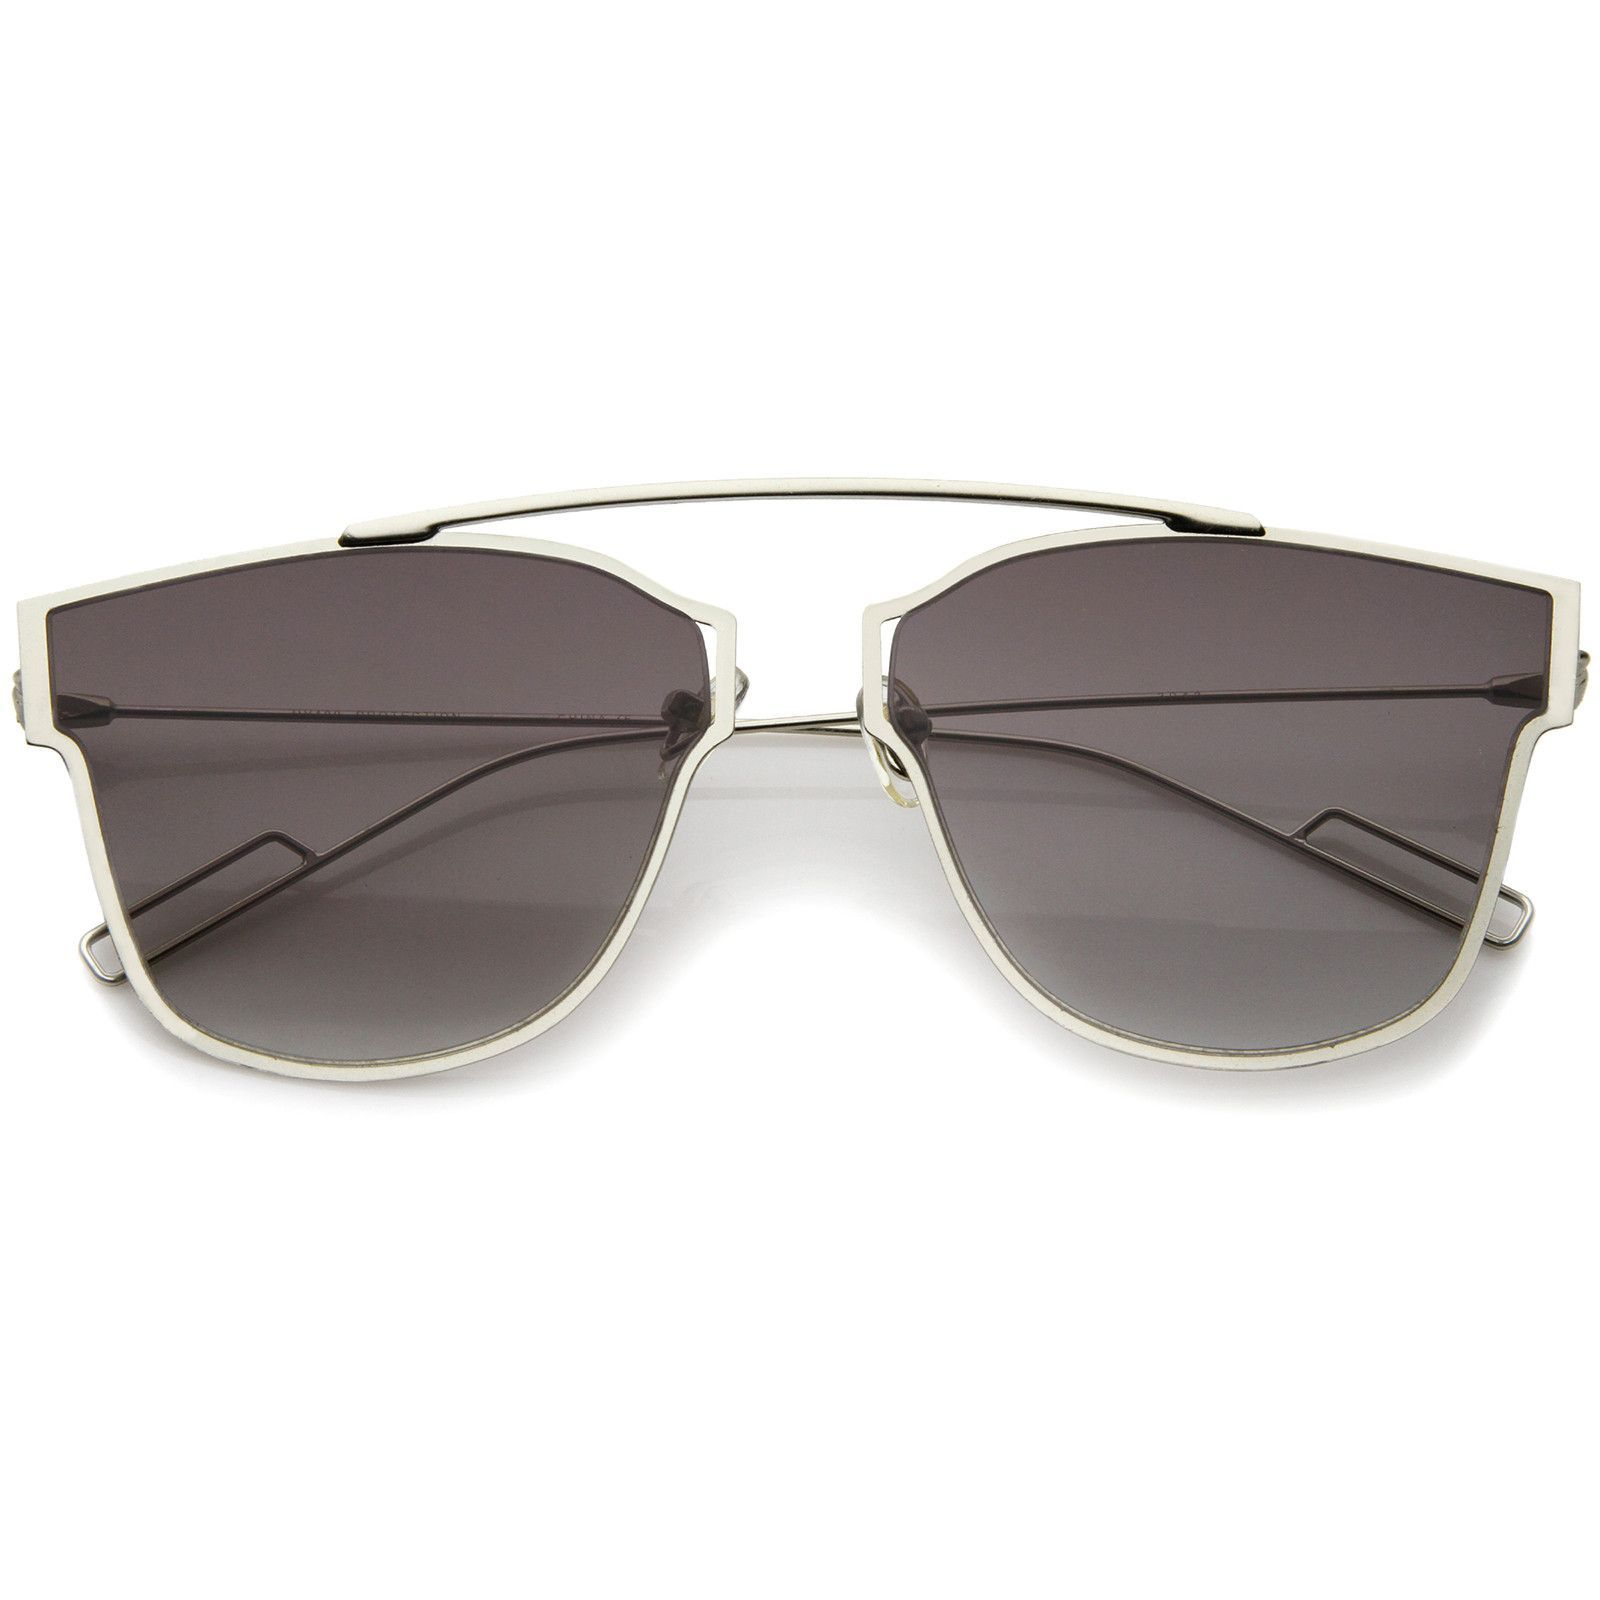 Modern Fashion Ultra Thin Open Metal Minimalist Pantos Aviator Sunglasses 55mm